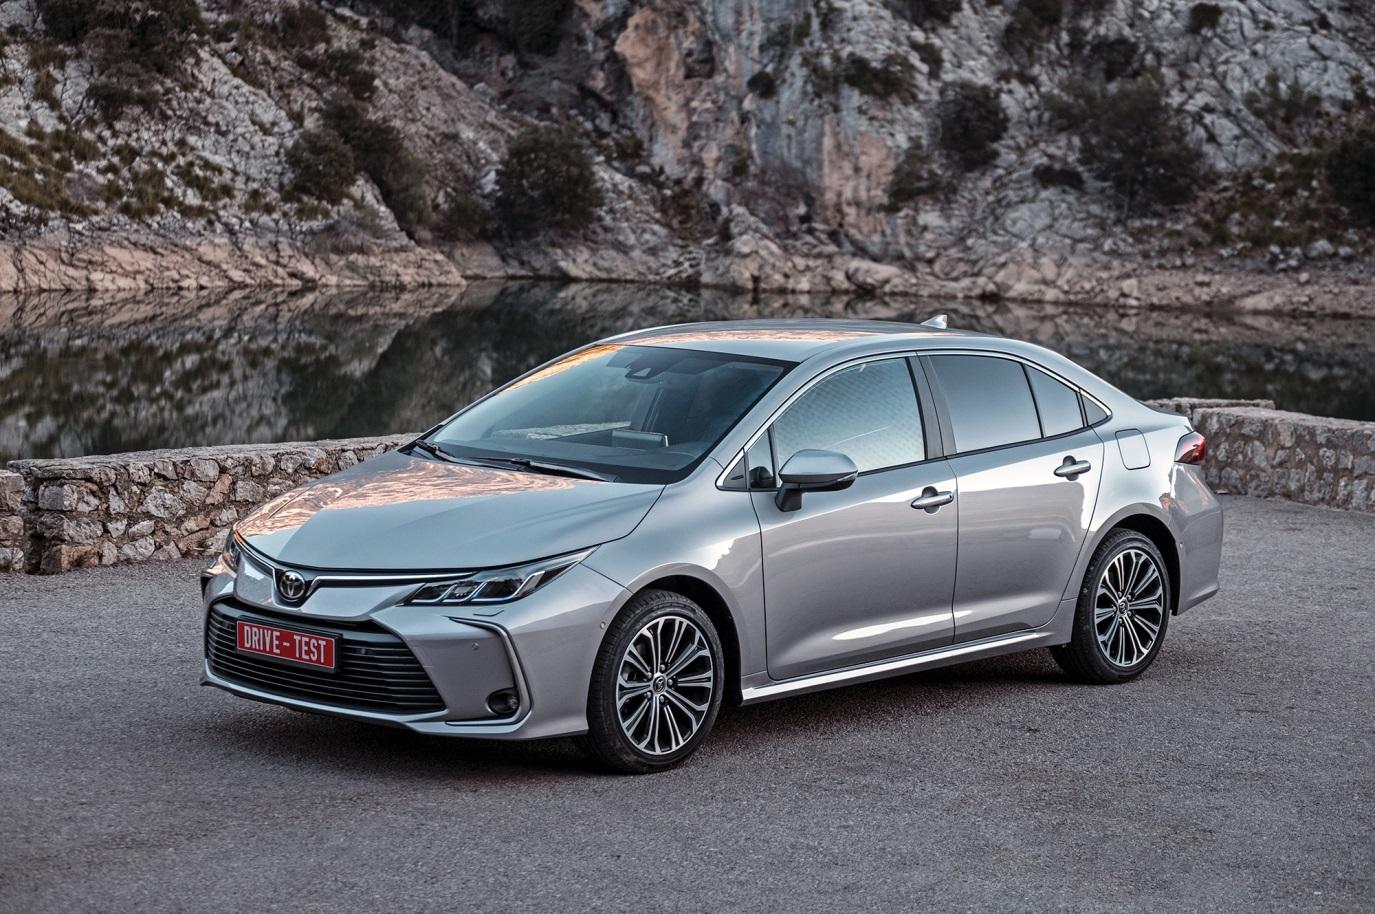 C:\Users\Jialing\Desktop\20190605\Car Guide\euro-四分之三\丰田Corolla.jpg